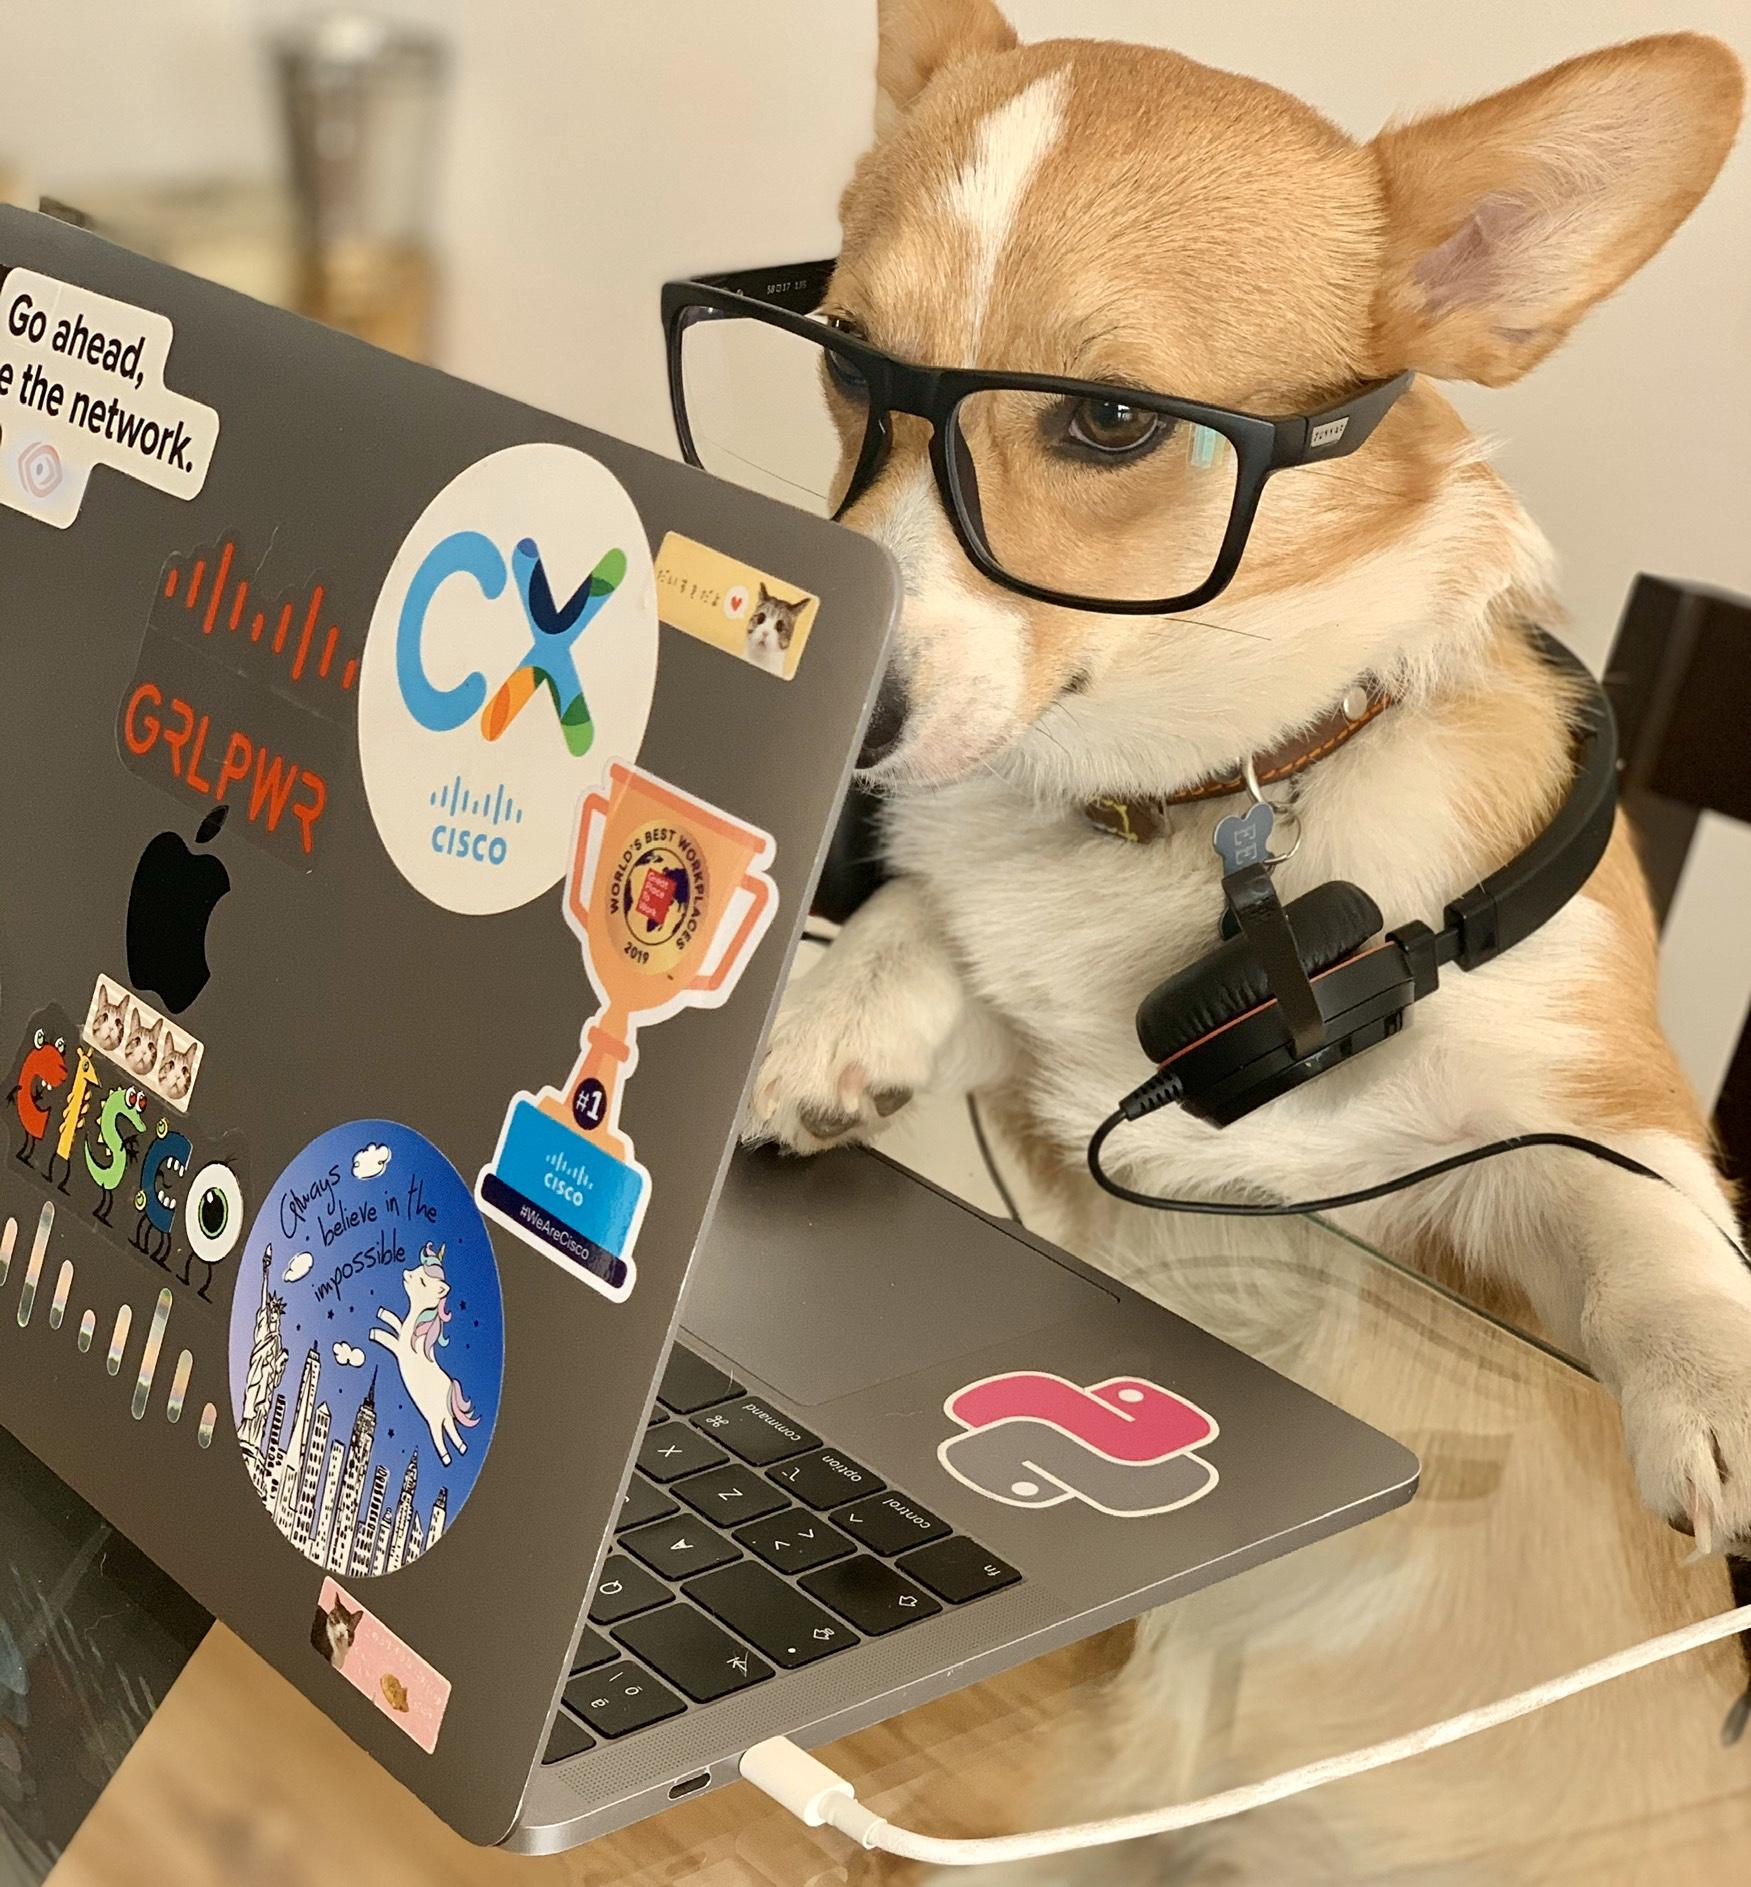 Cisco Pet wearing glasses behind laptop.